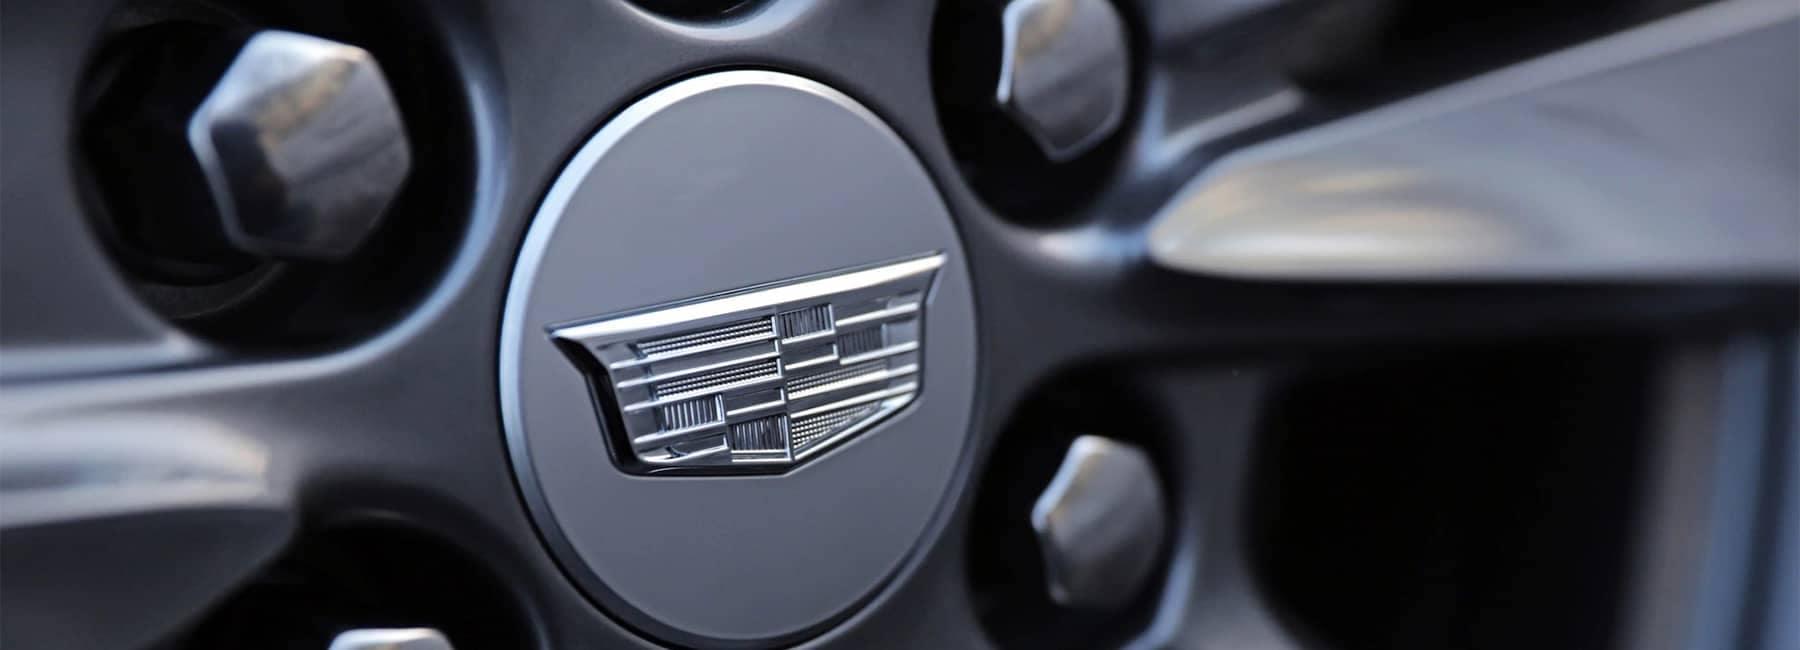 2020 Cadillac XT6 rim detail